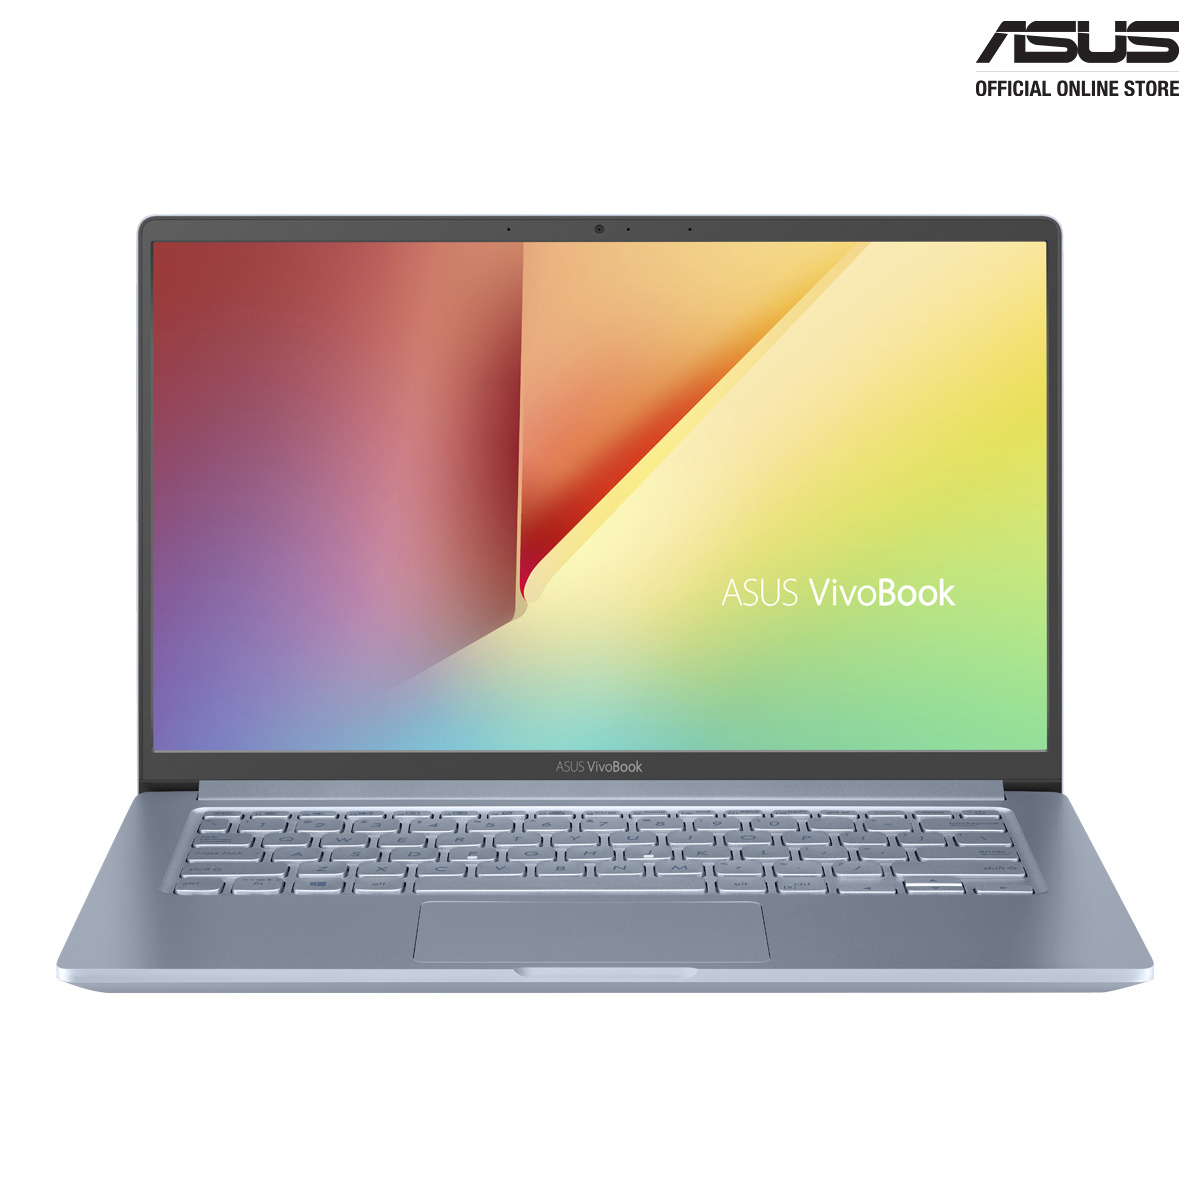 ASUSASUS Vivobook S14 Z403FA-EB077T (Silver Blue)